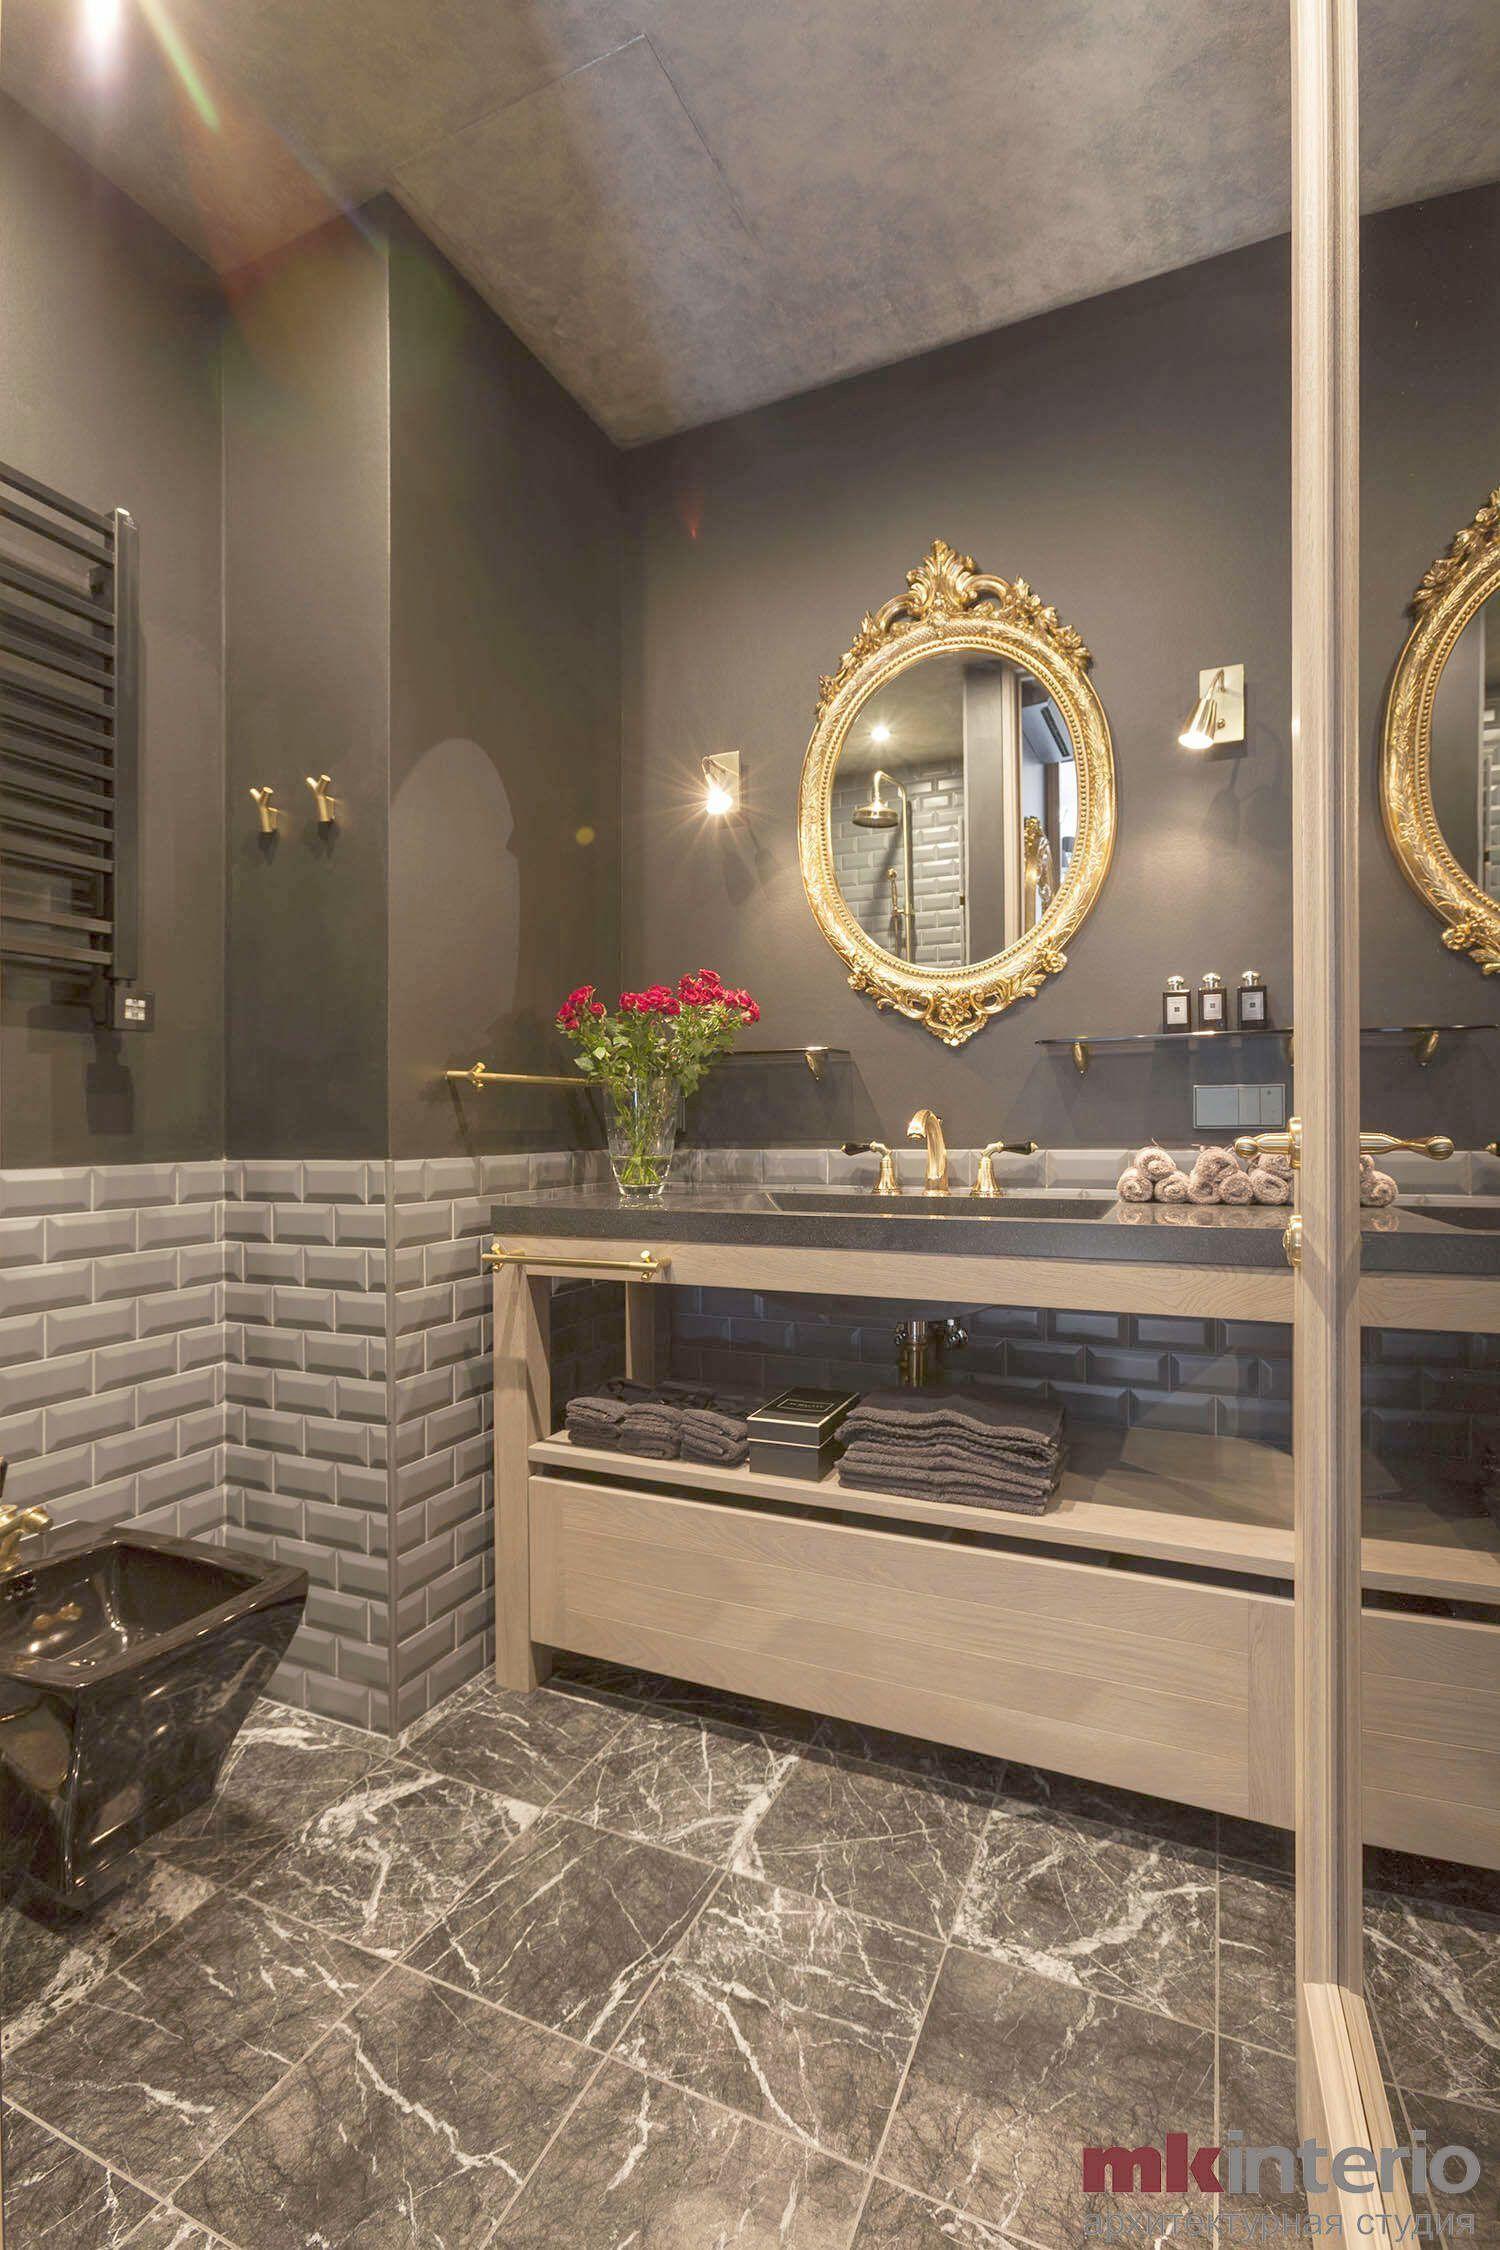 Bathroom Rentals Near Me Few Bathroom Ideas Gray Tile New